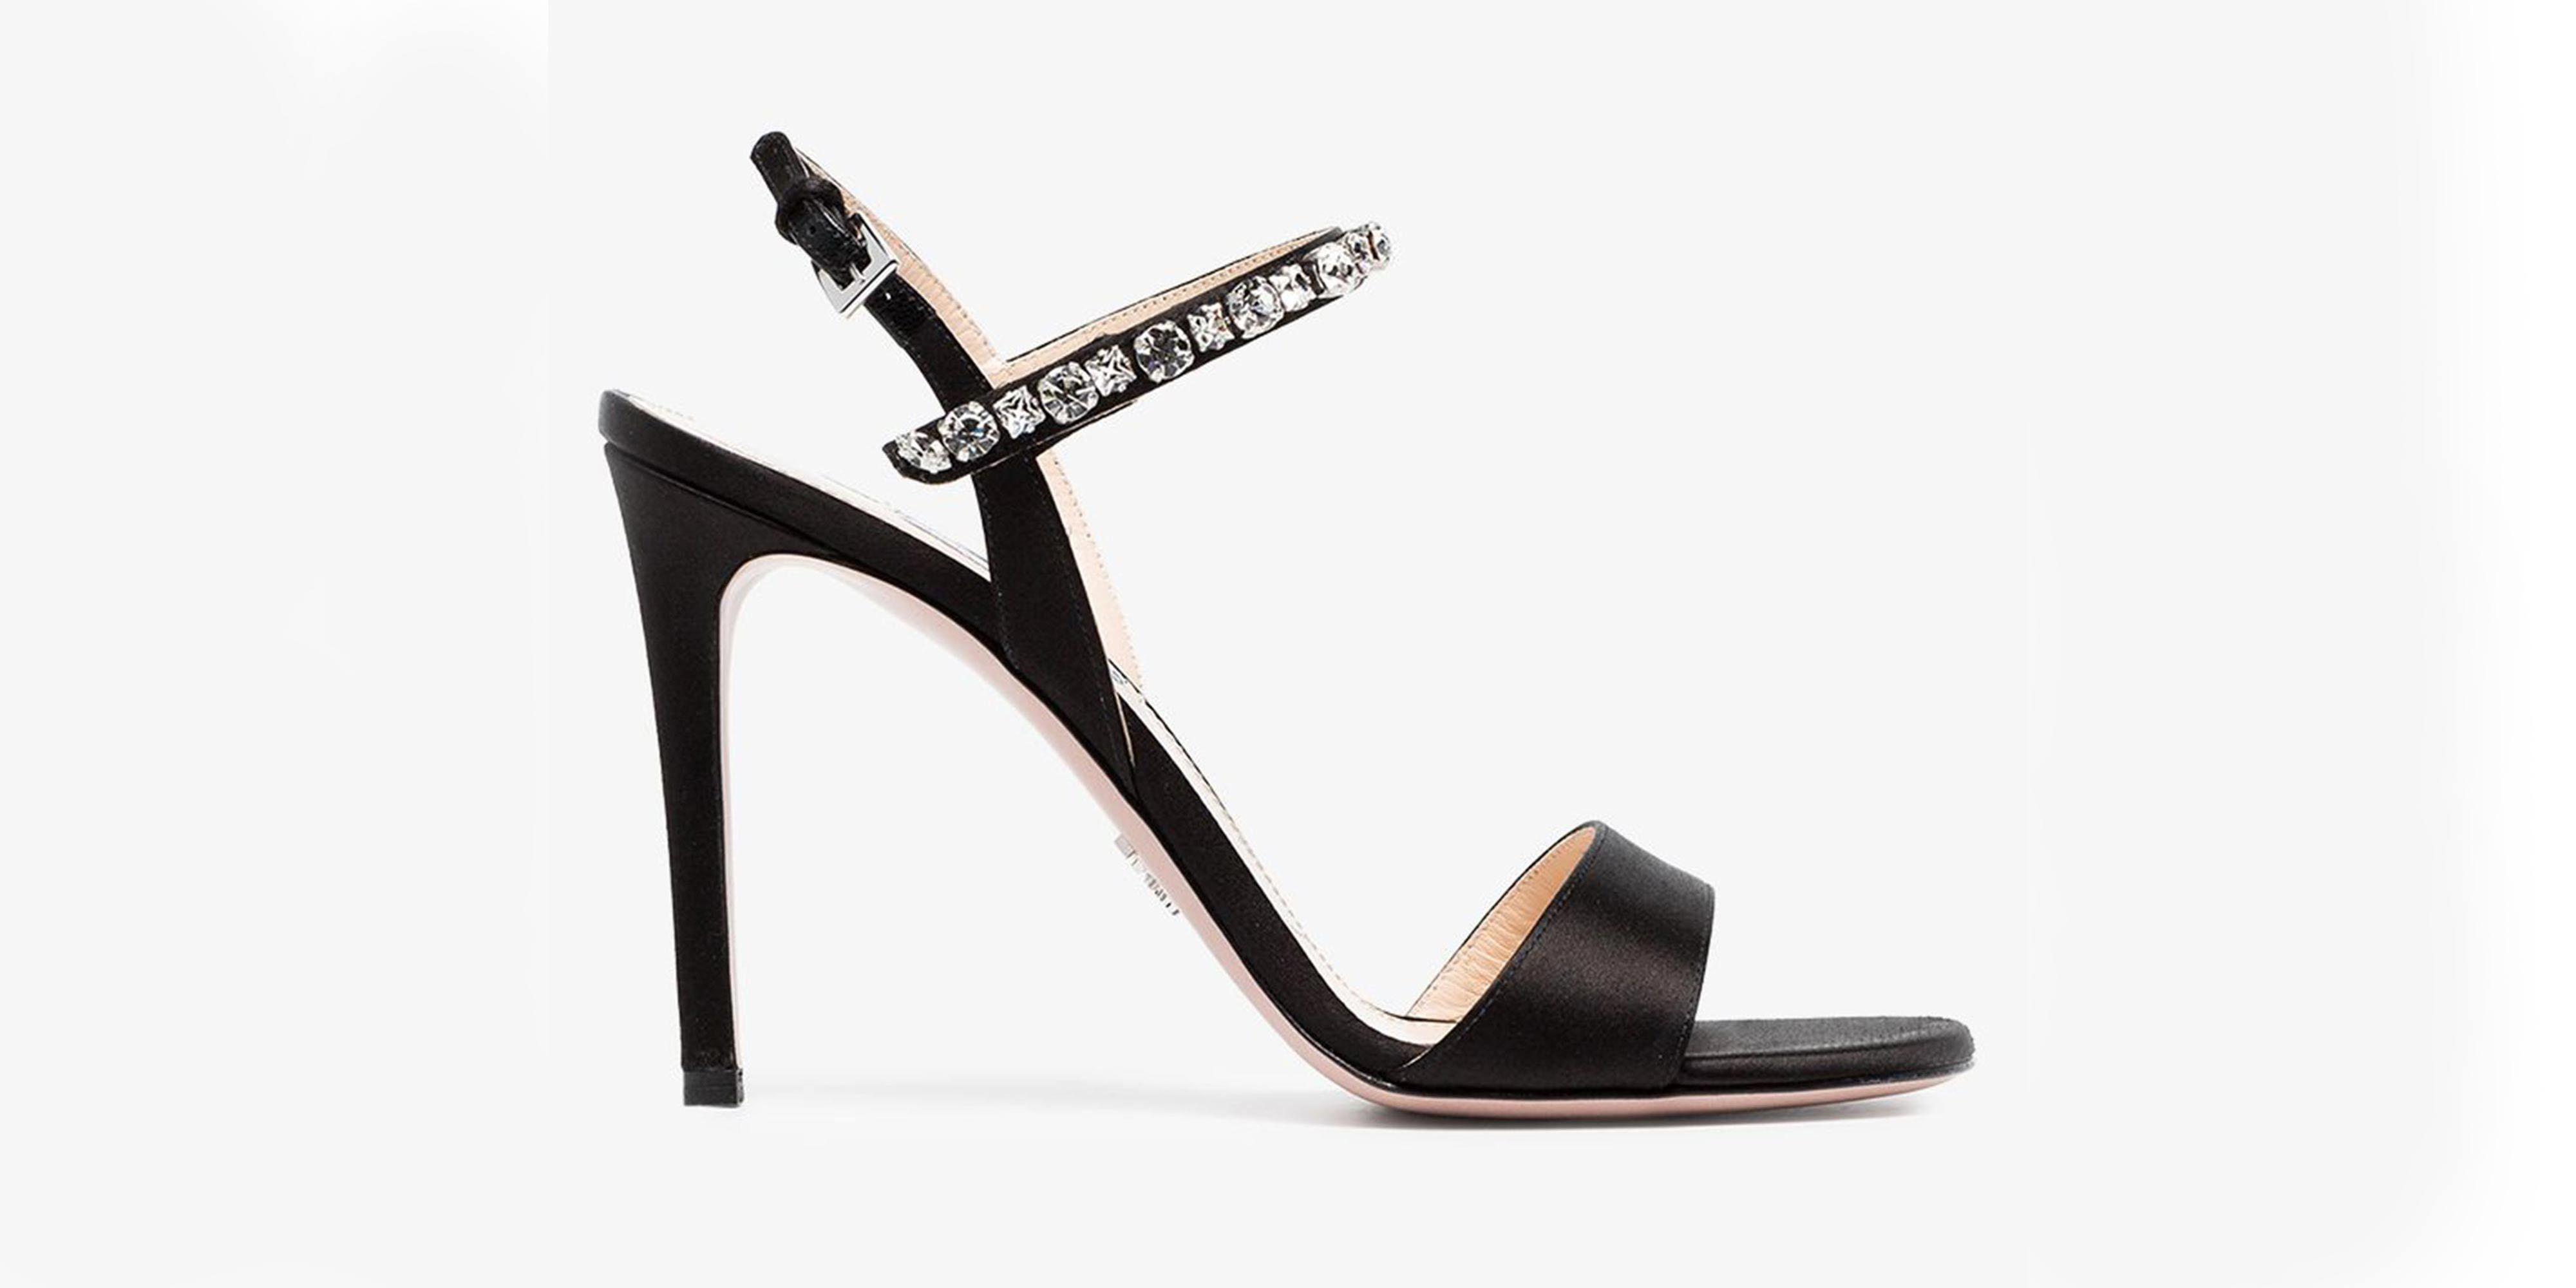 Shoe Autumnwinter Trends Shoes Key 2018 EHW9YDI2